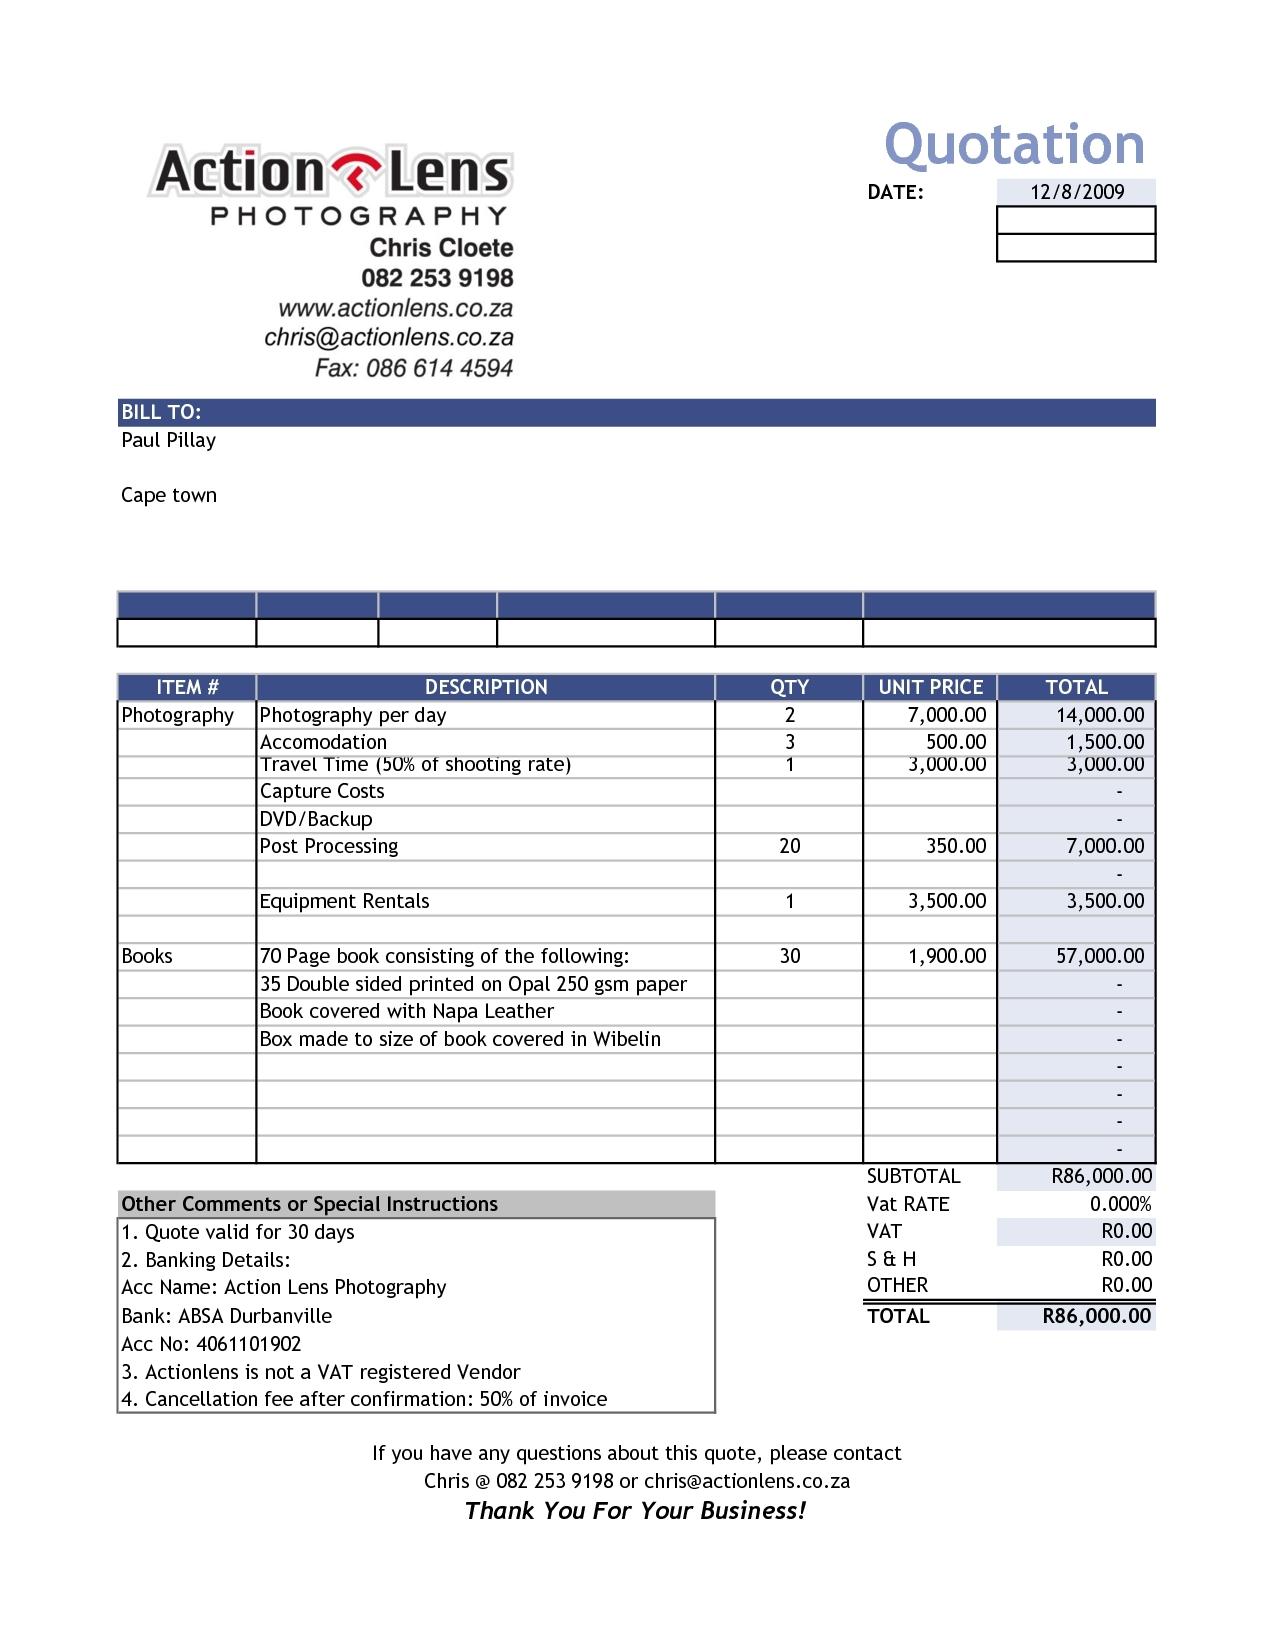 sale invoice format invoice template free 2016 sale invoice sample